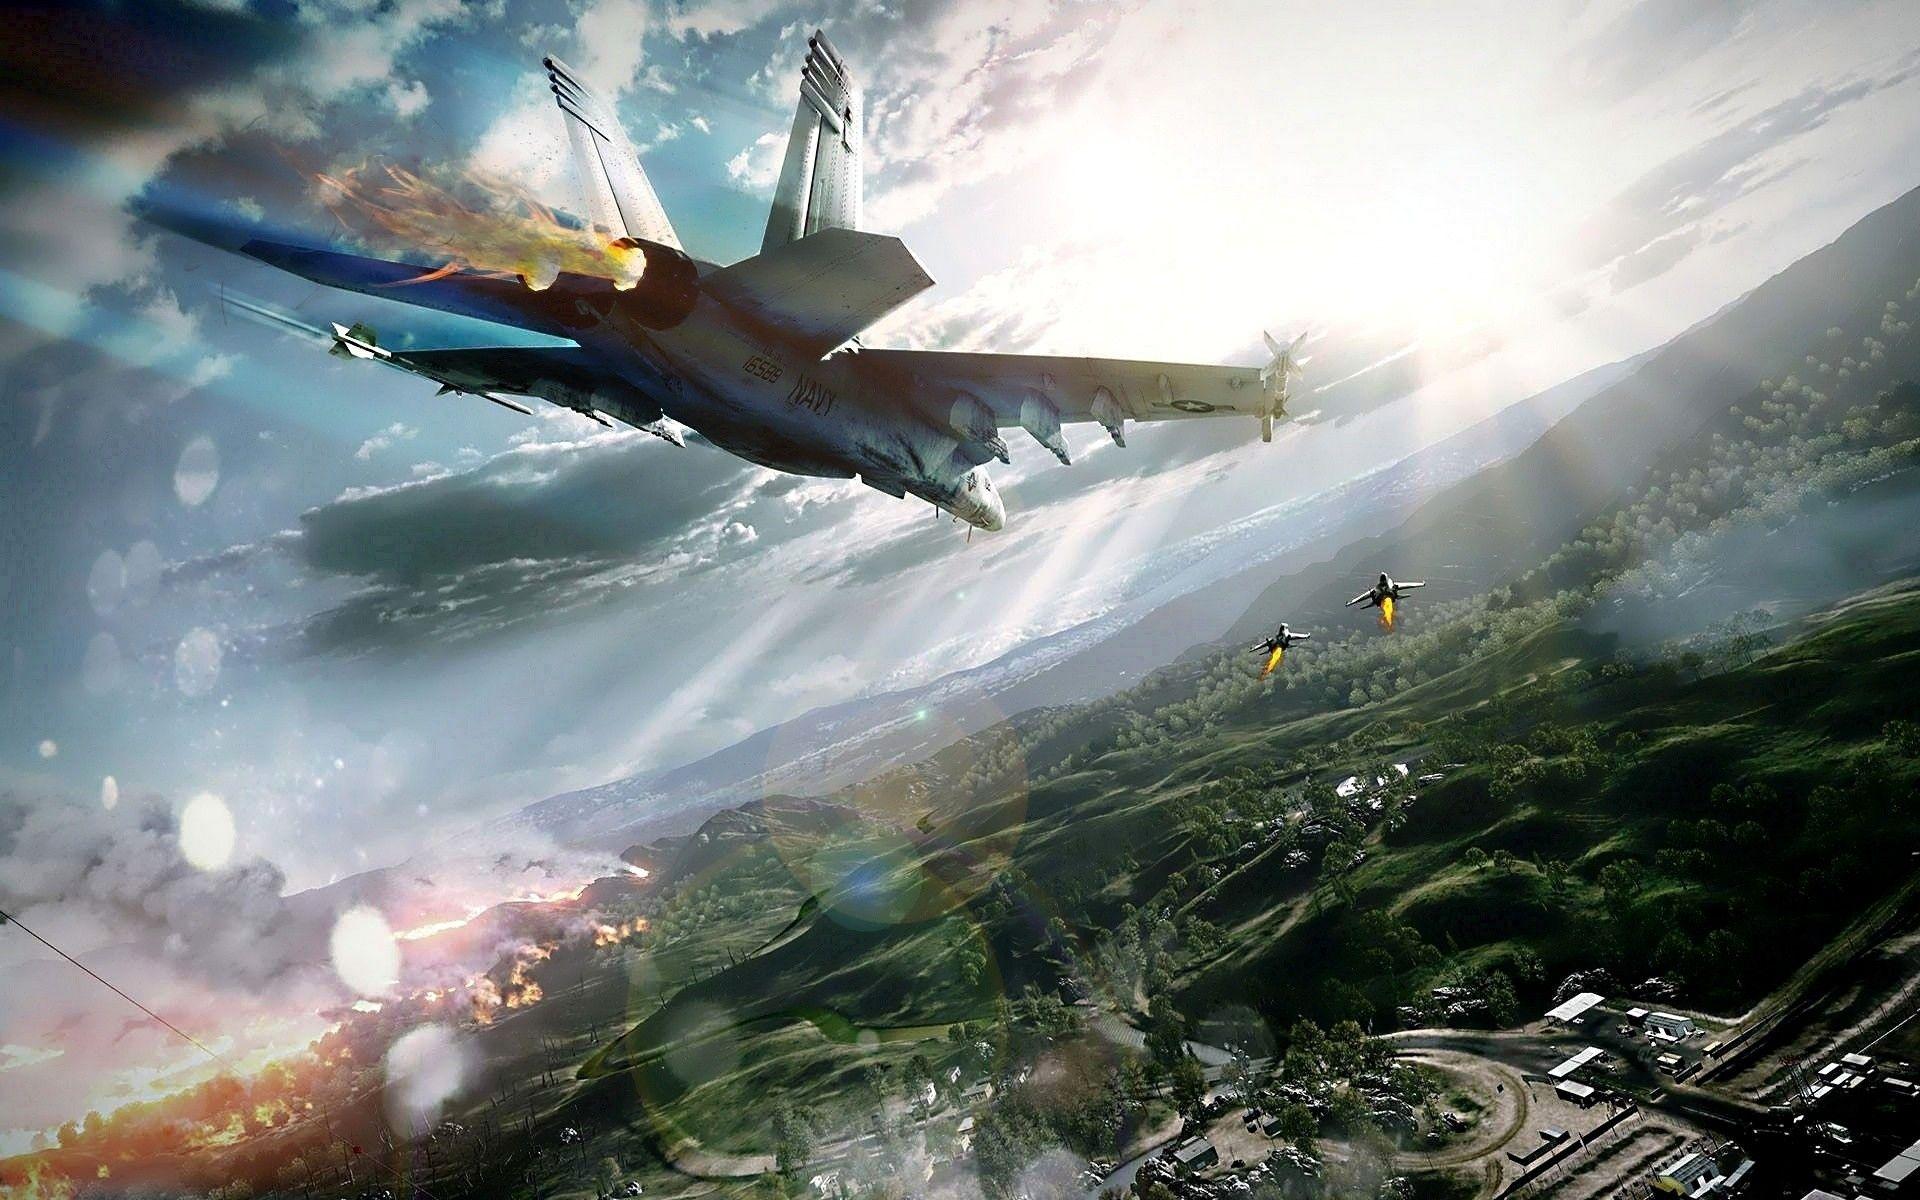 014ec4feebf7c654ba5fe570ee7a6b73 - How To Get In A Plane In Battlefield 1